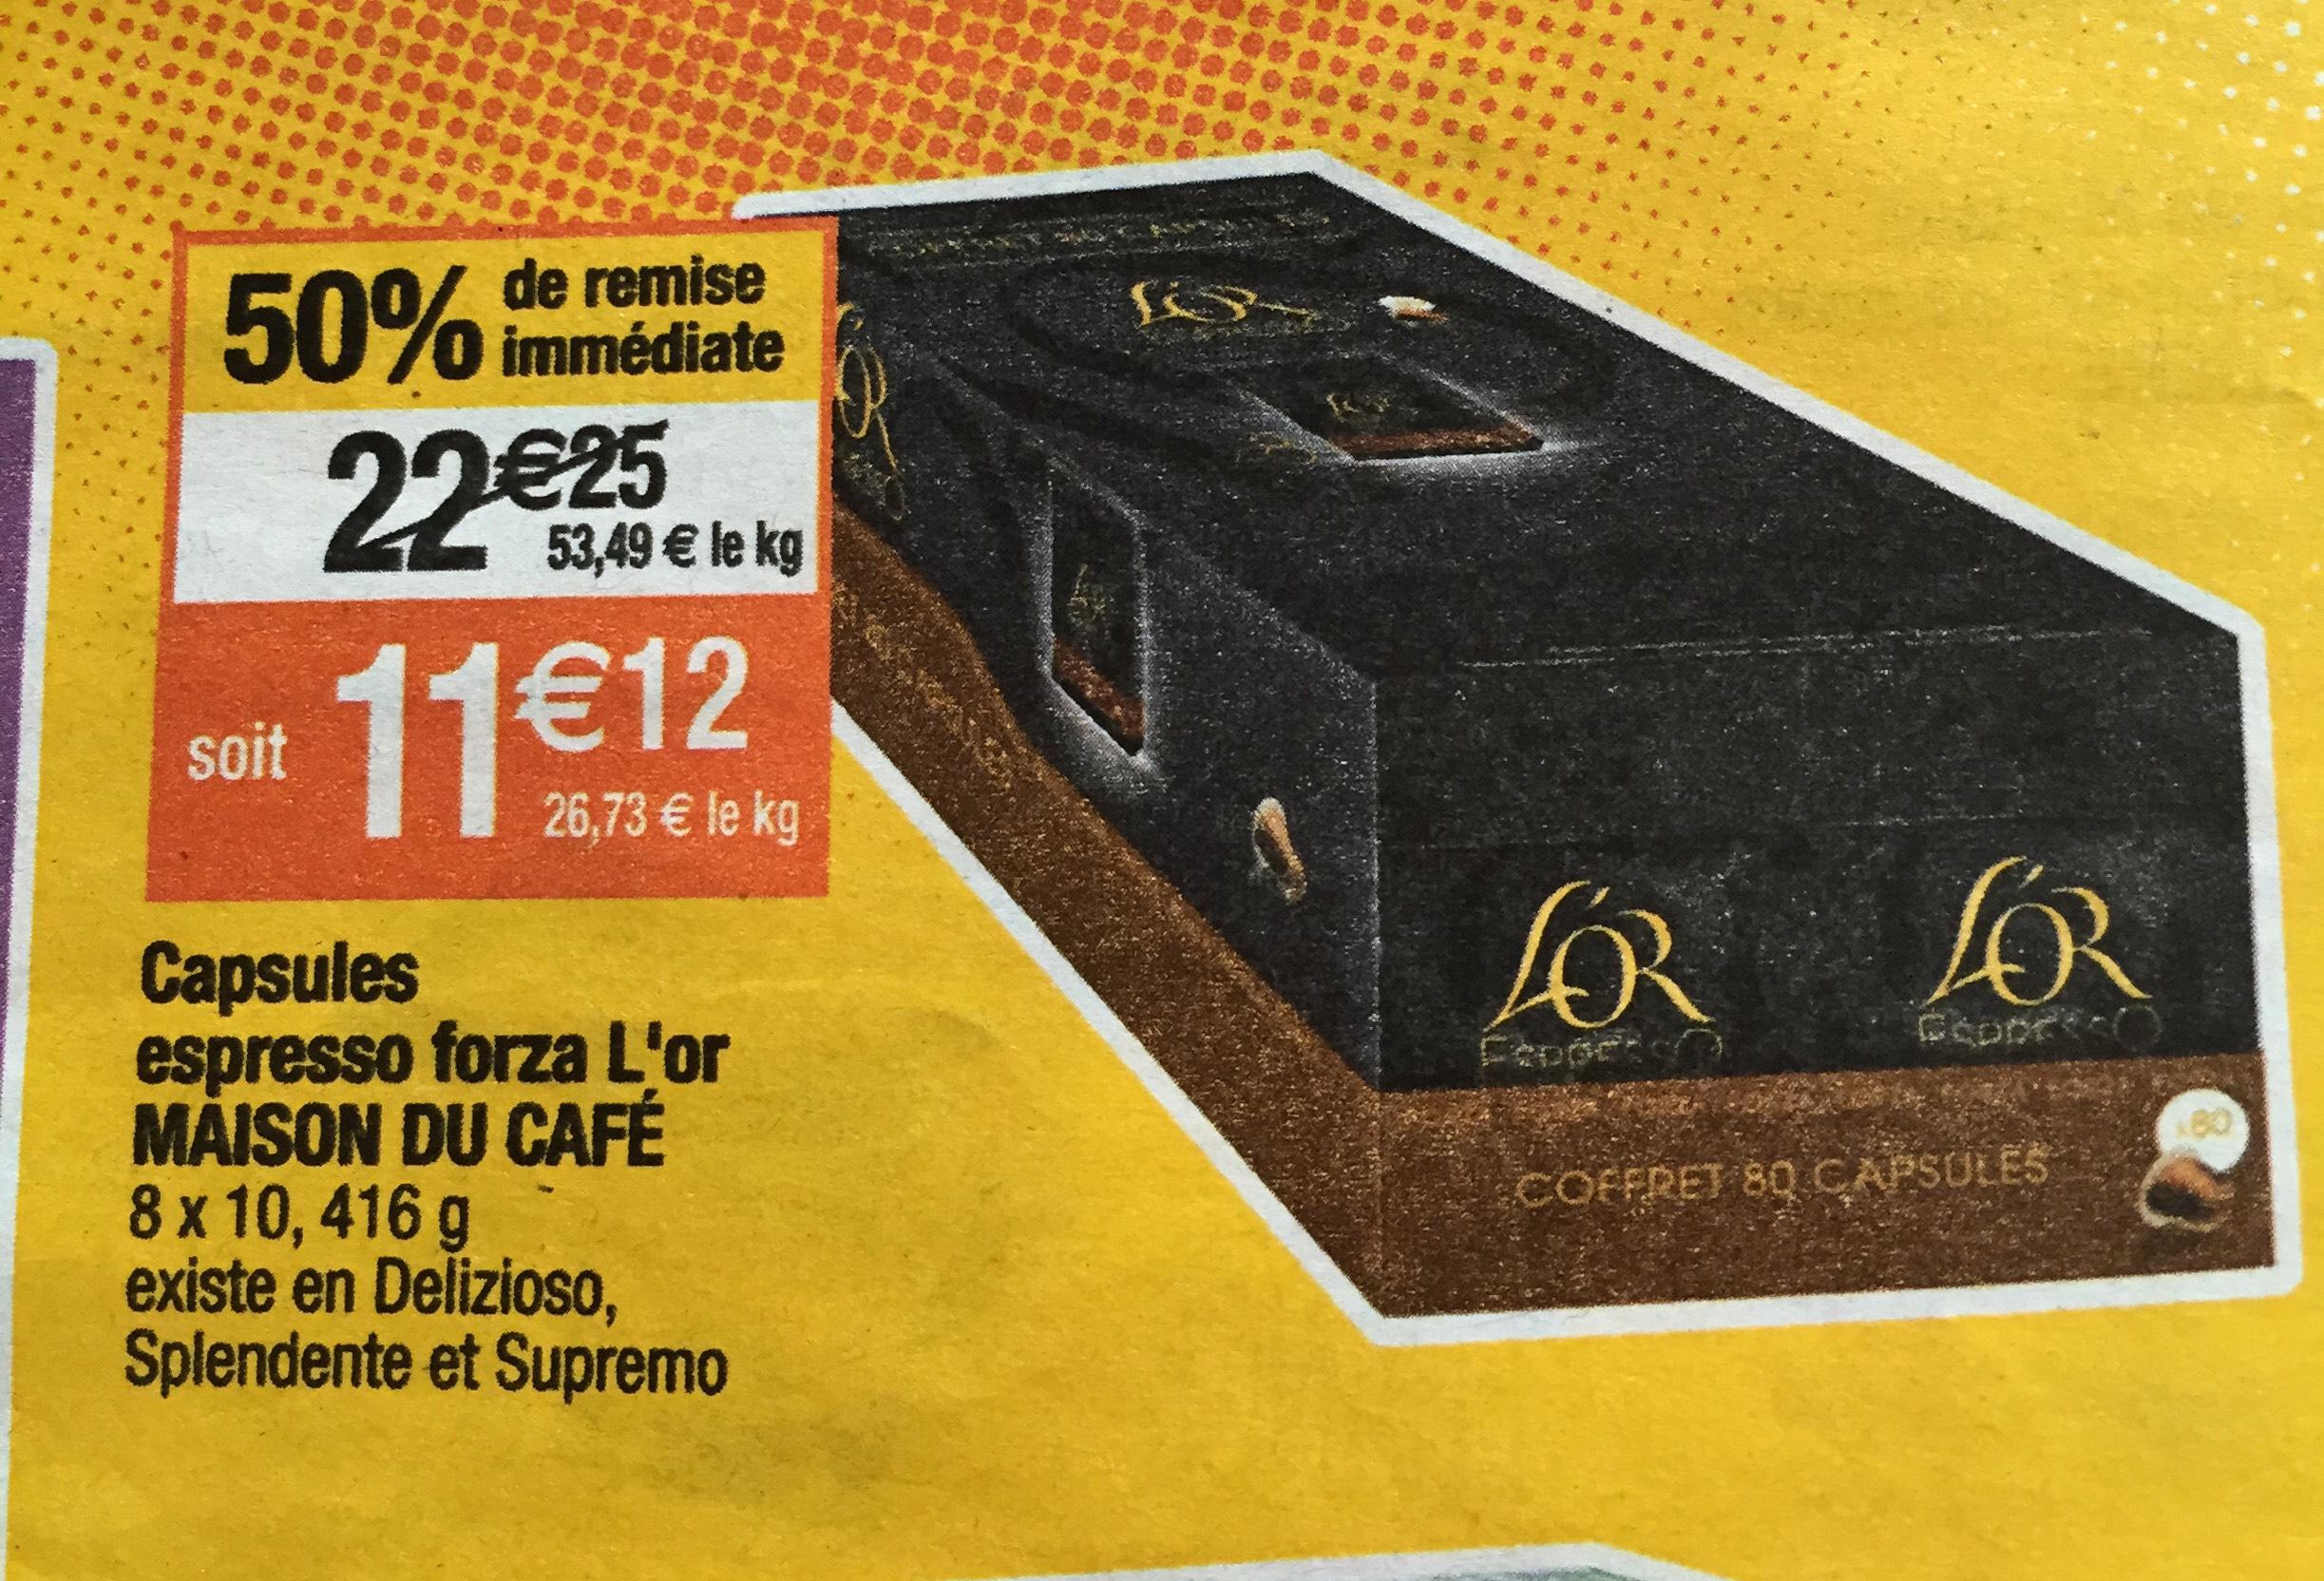 Coffret de 80 capsules L'or espresso